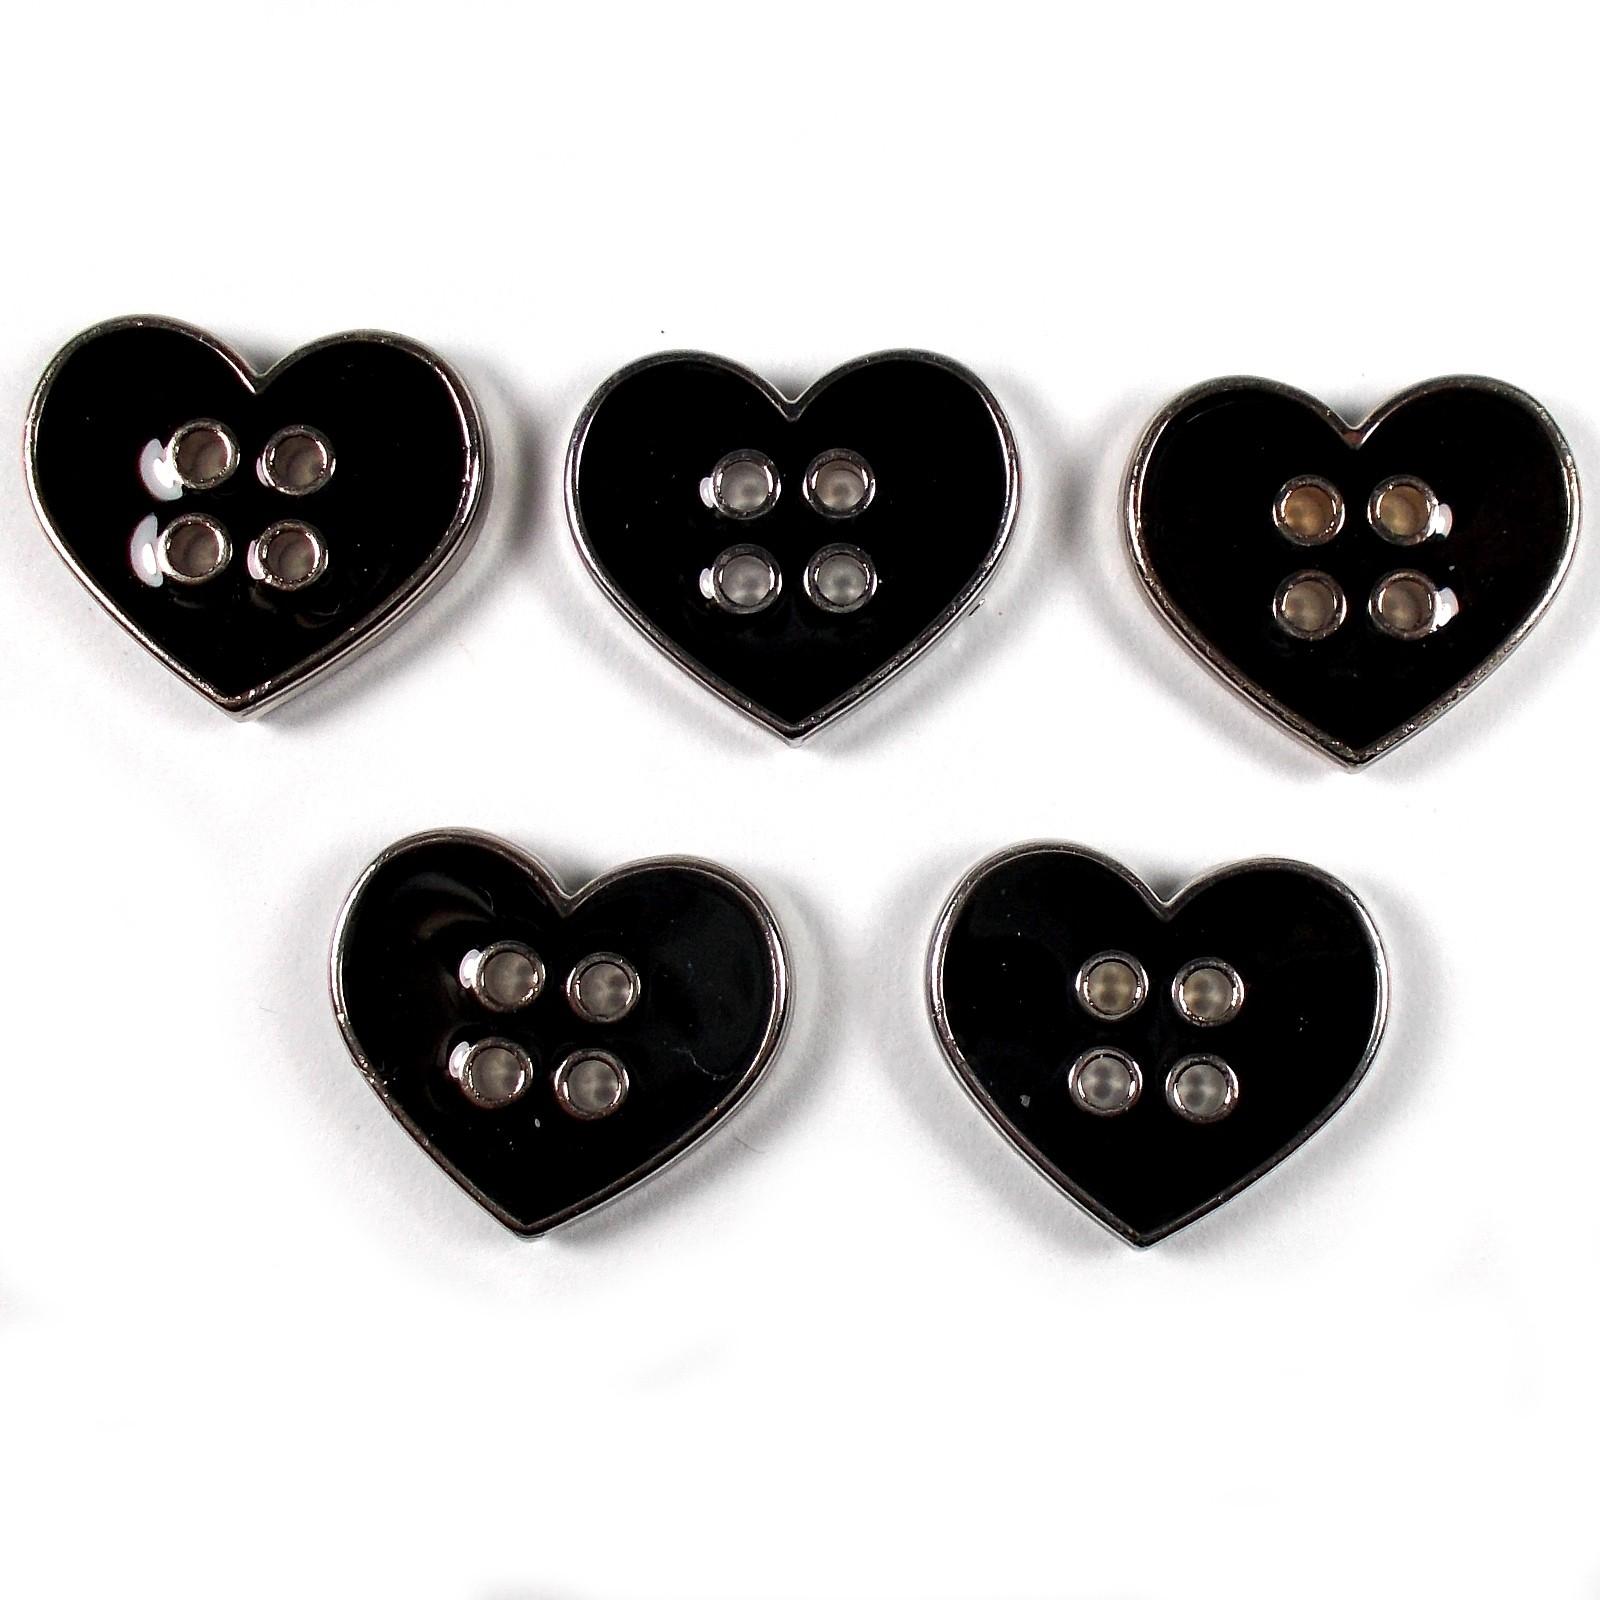 Enamel Metal 4 Hole Heart Silver Colour Buttons 11mm Black